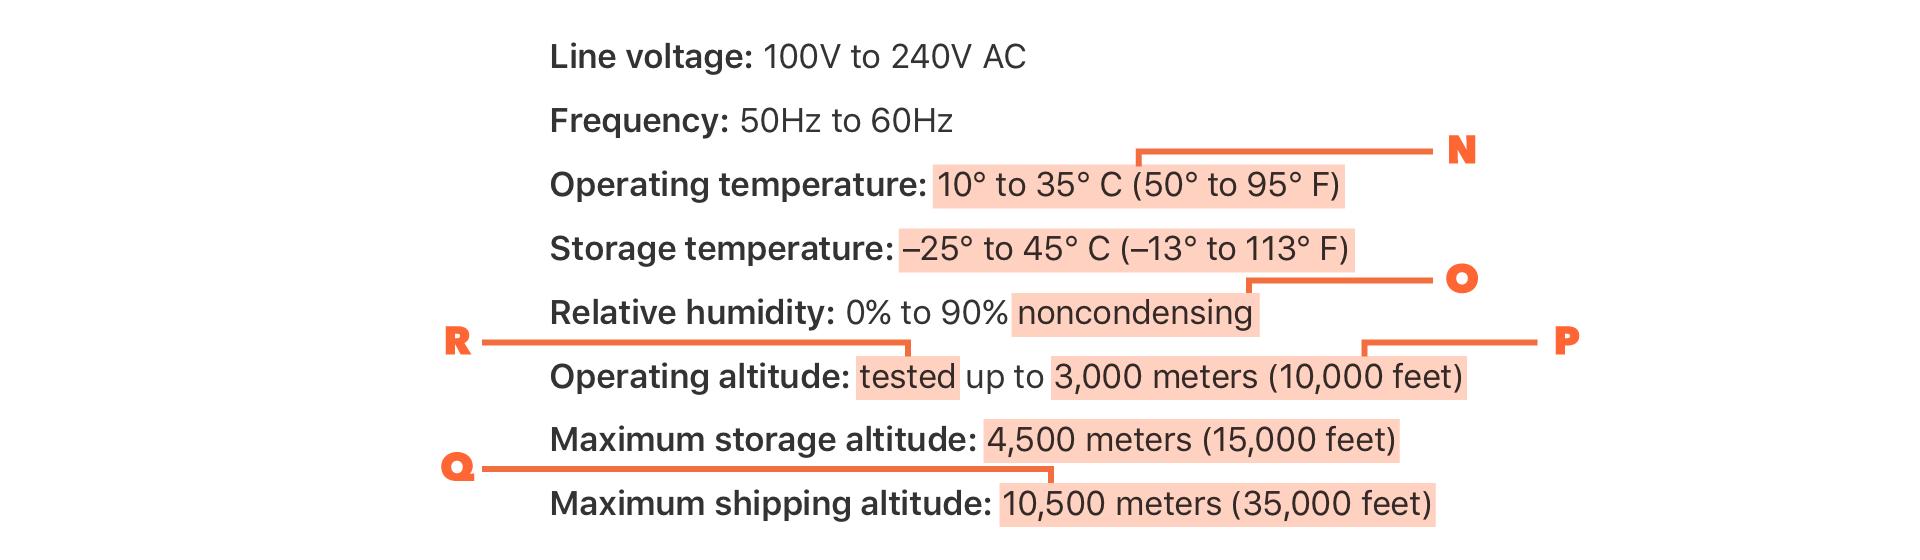 Macbook Pro 電力条件と動作環境(HK)